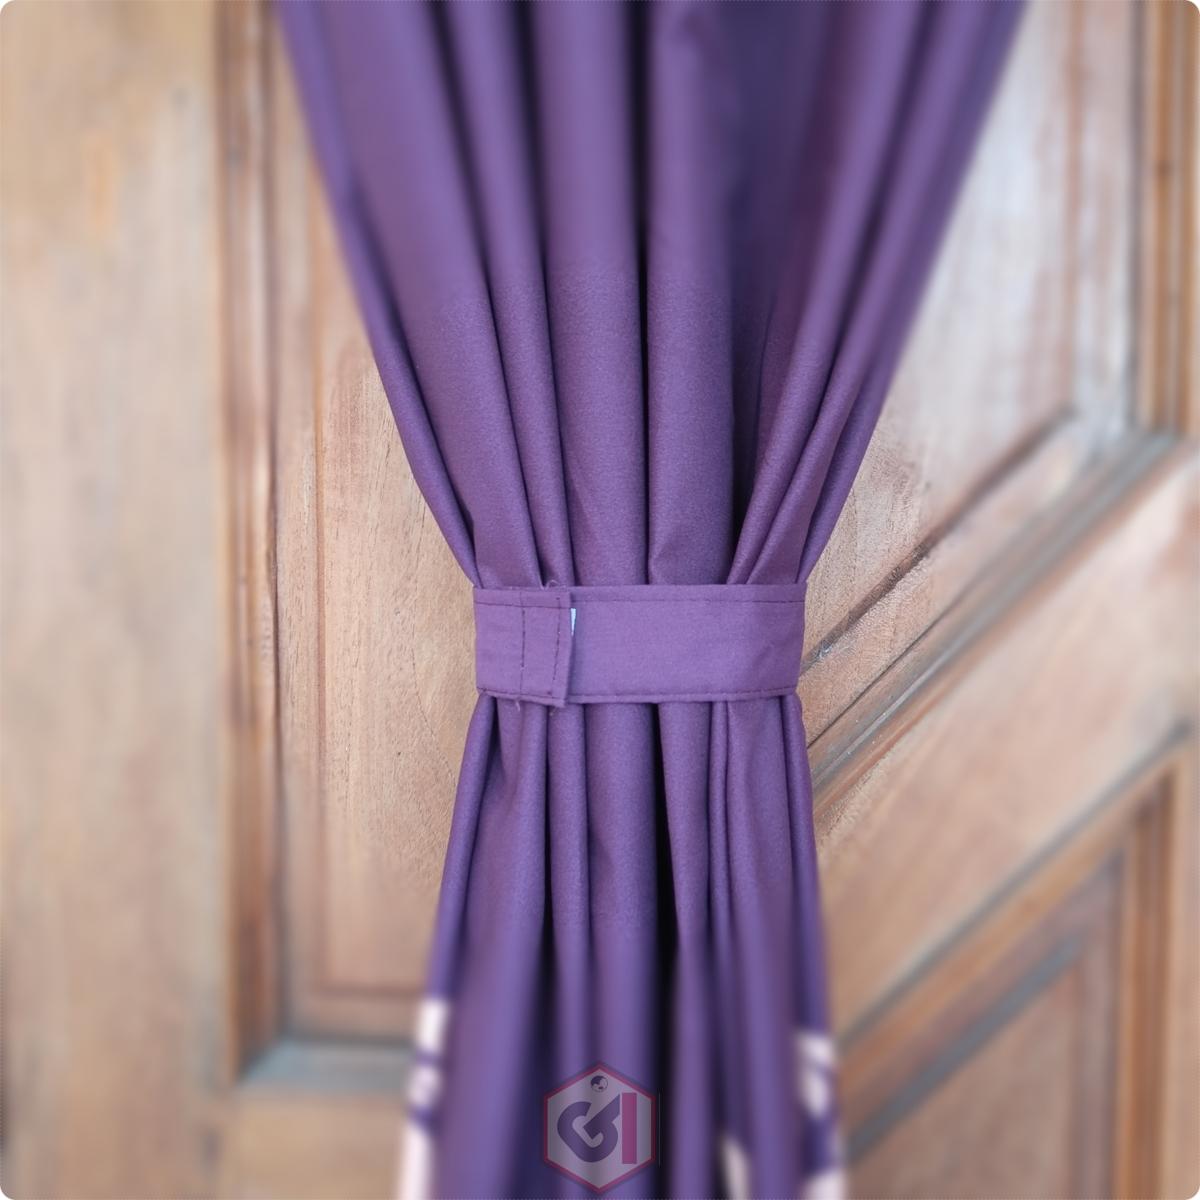 Gorden Pintu Rumah Motif Batik Ungu Model Smokring 12 Ring Ukuran Panjang Murah